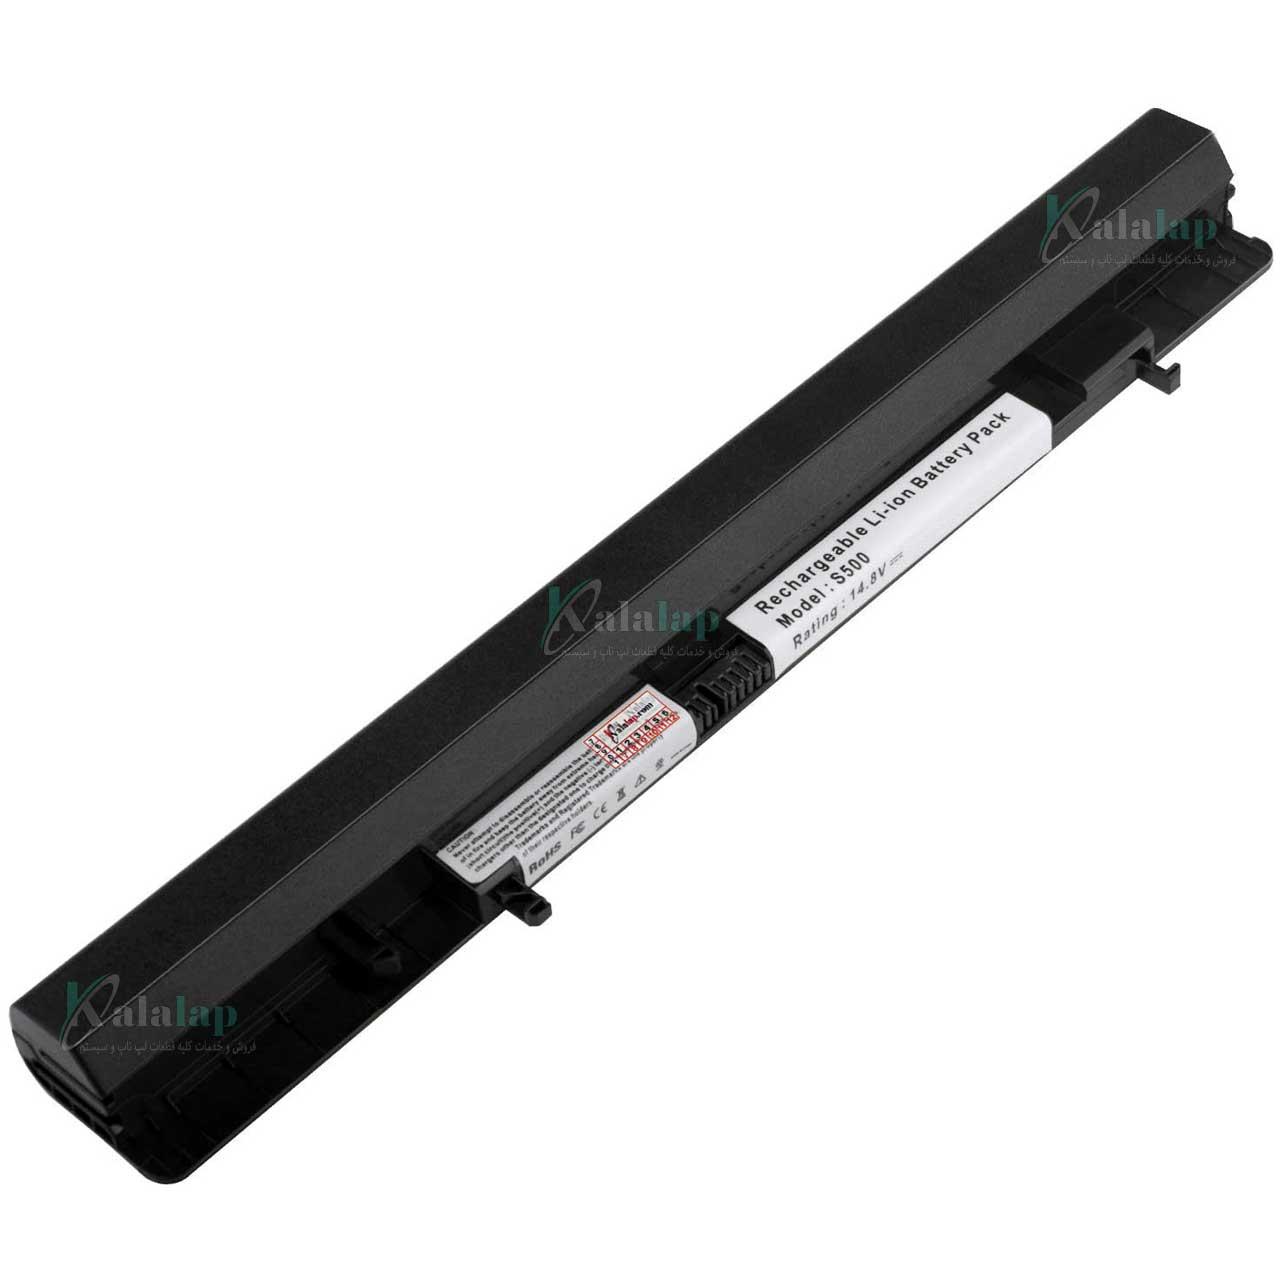 باتری لپ تاپ لنوو Lenovo S500 FLEX 14M 15M